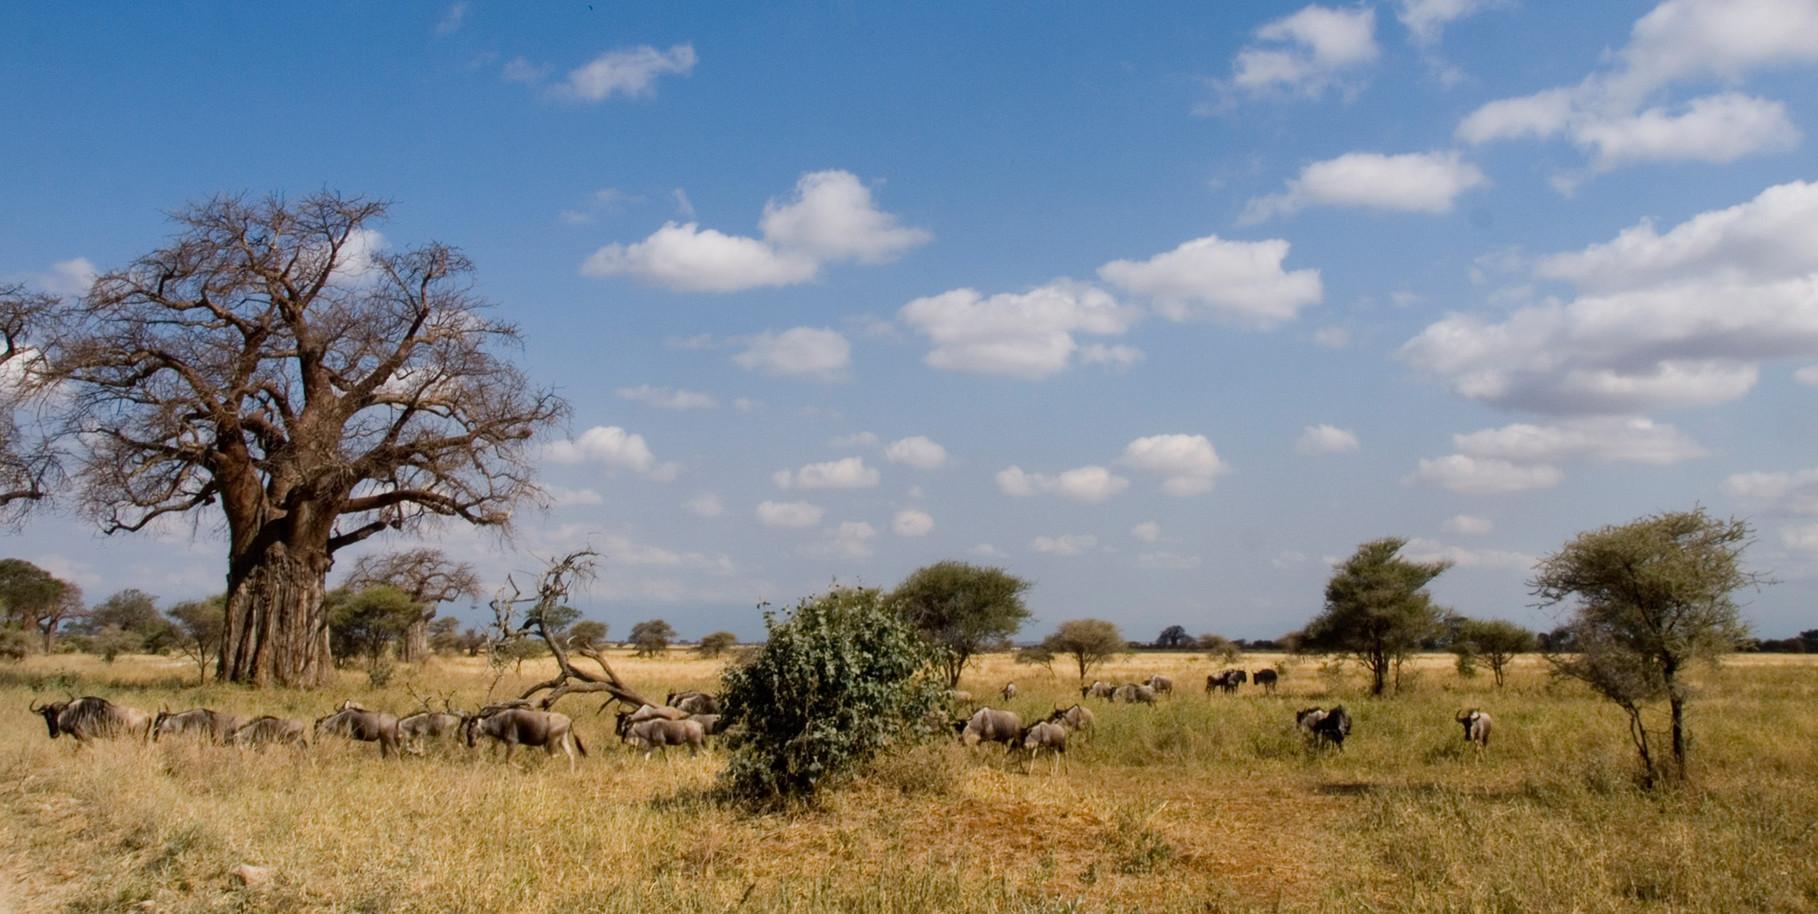 Scenery [Serengeti, Tanzania, 2012]